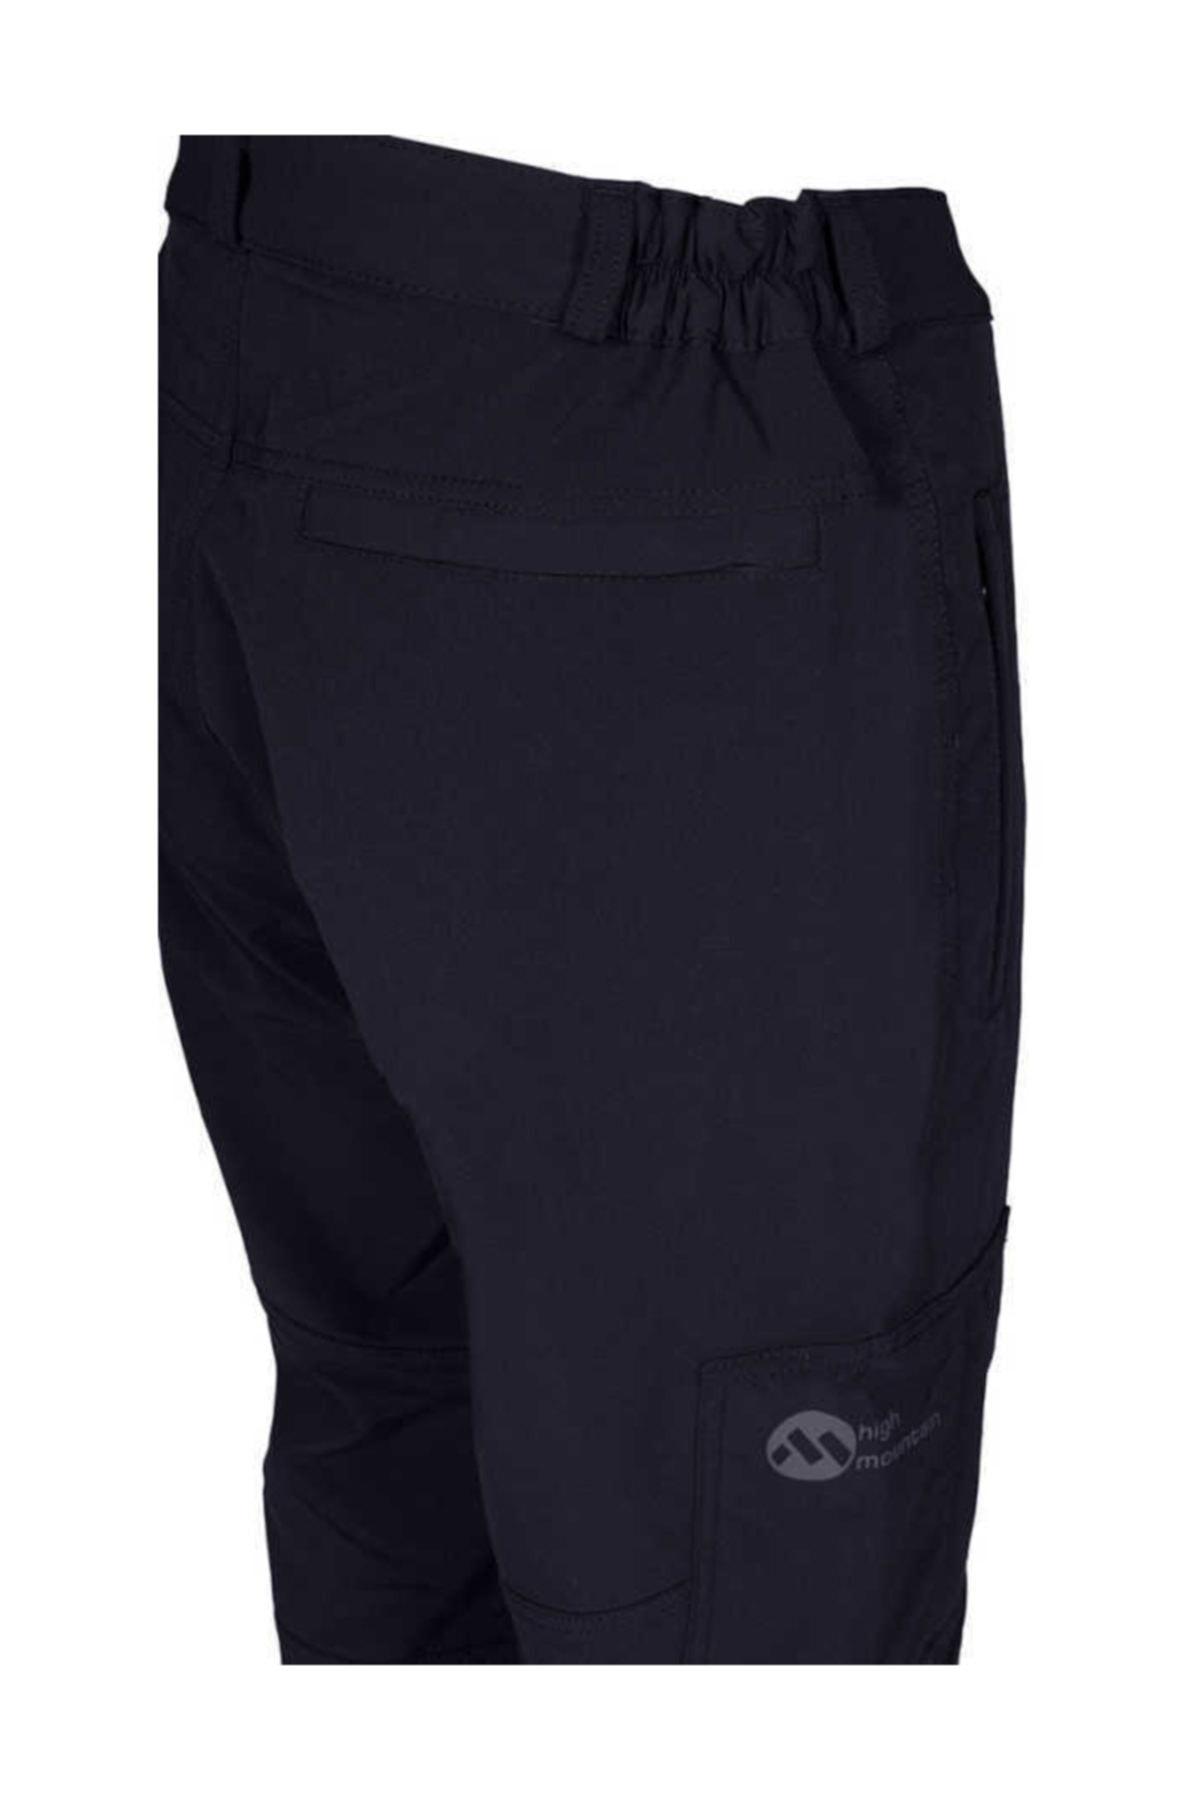 High Mountain Nepal Pantolon Siyah 2